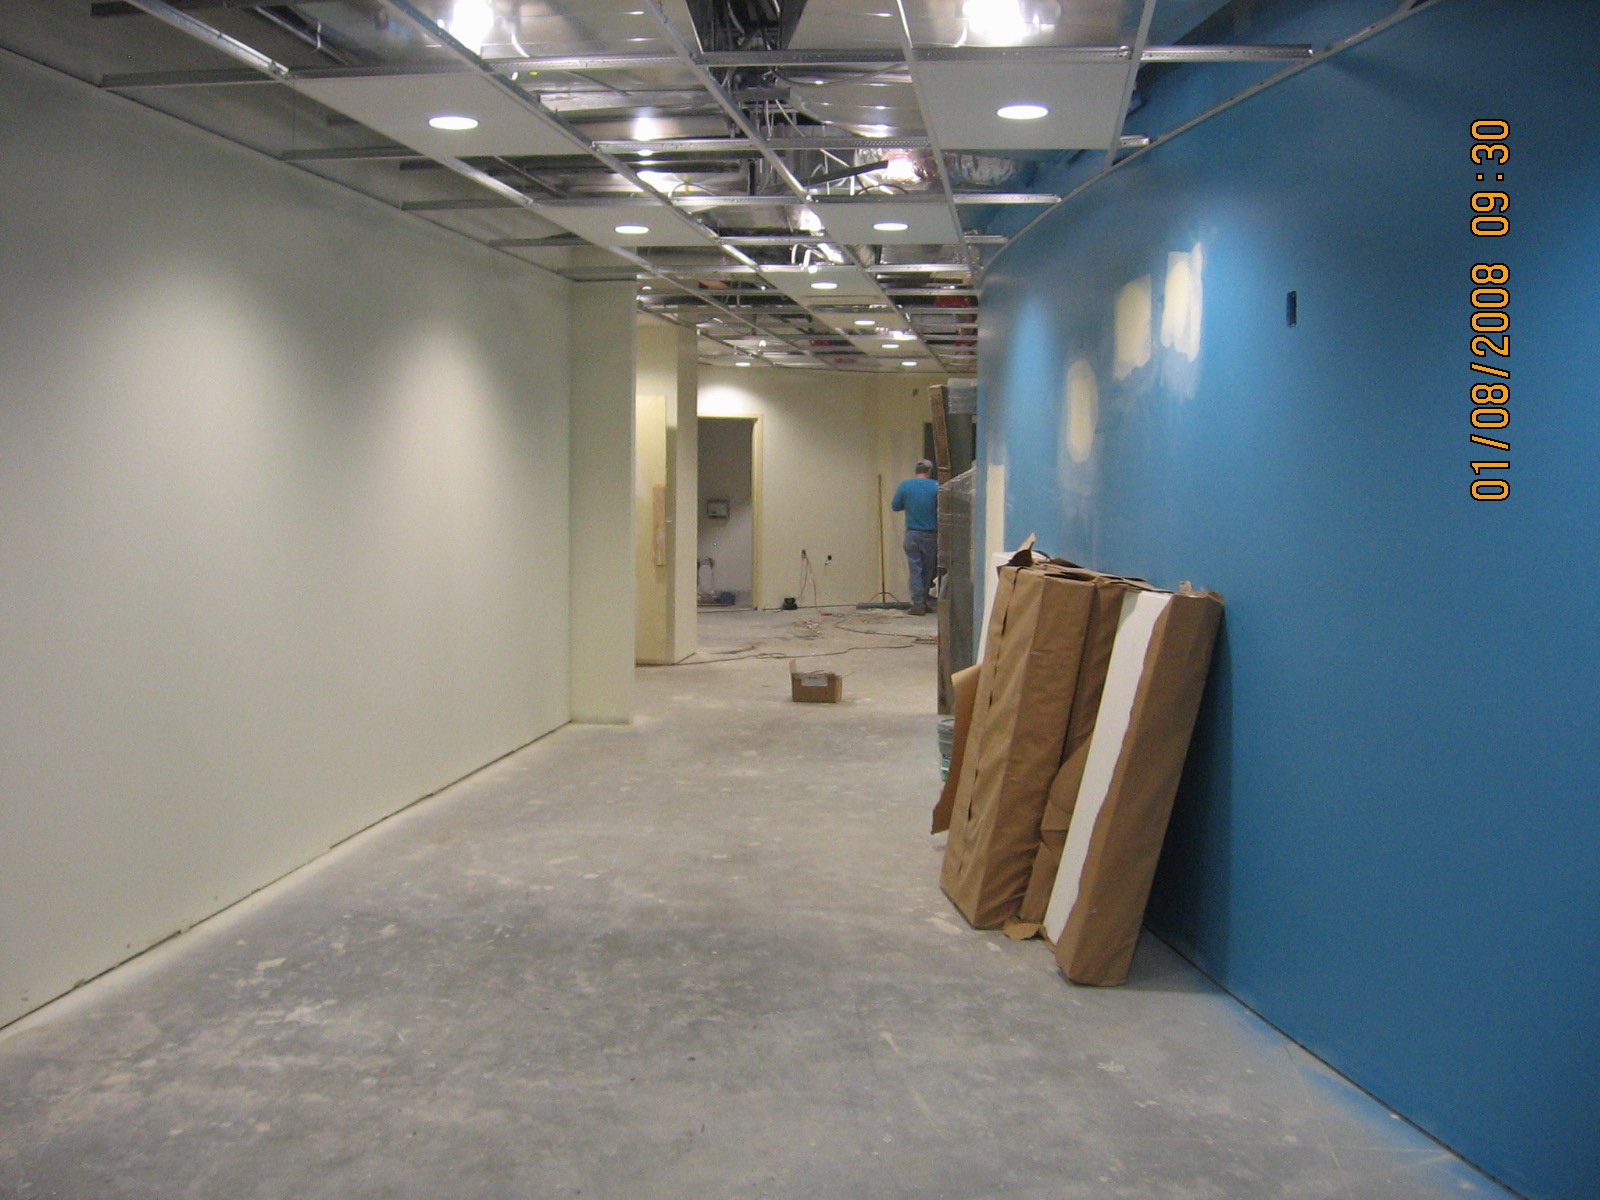 2008, January 11